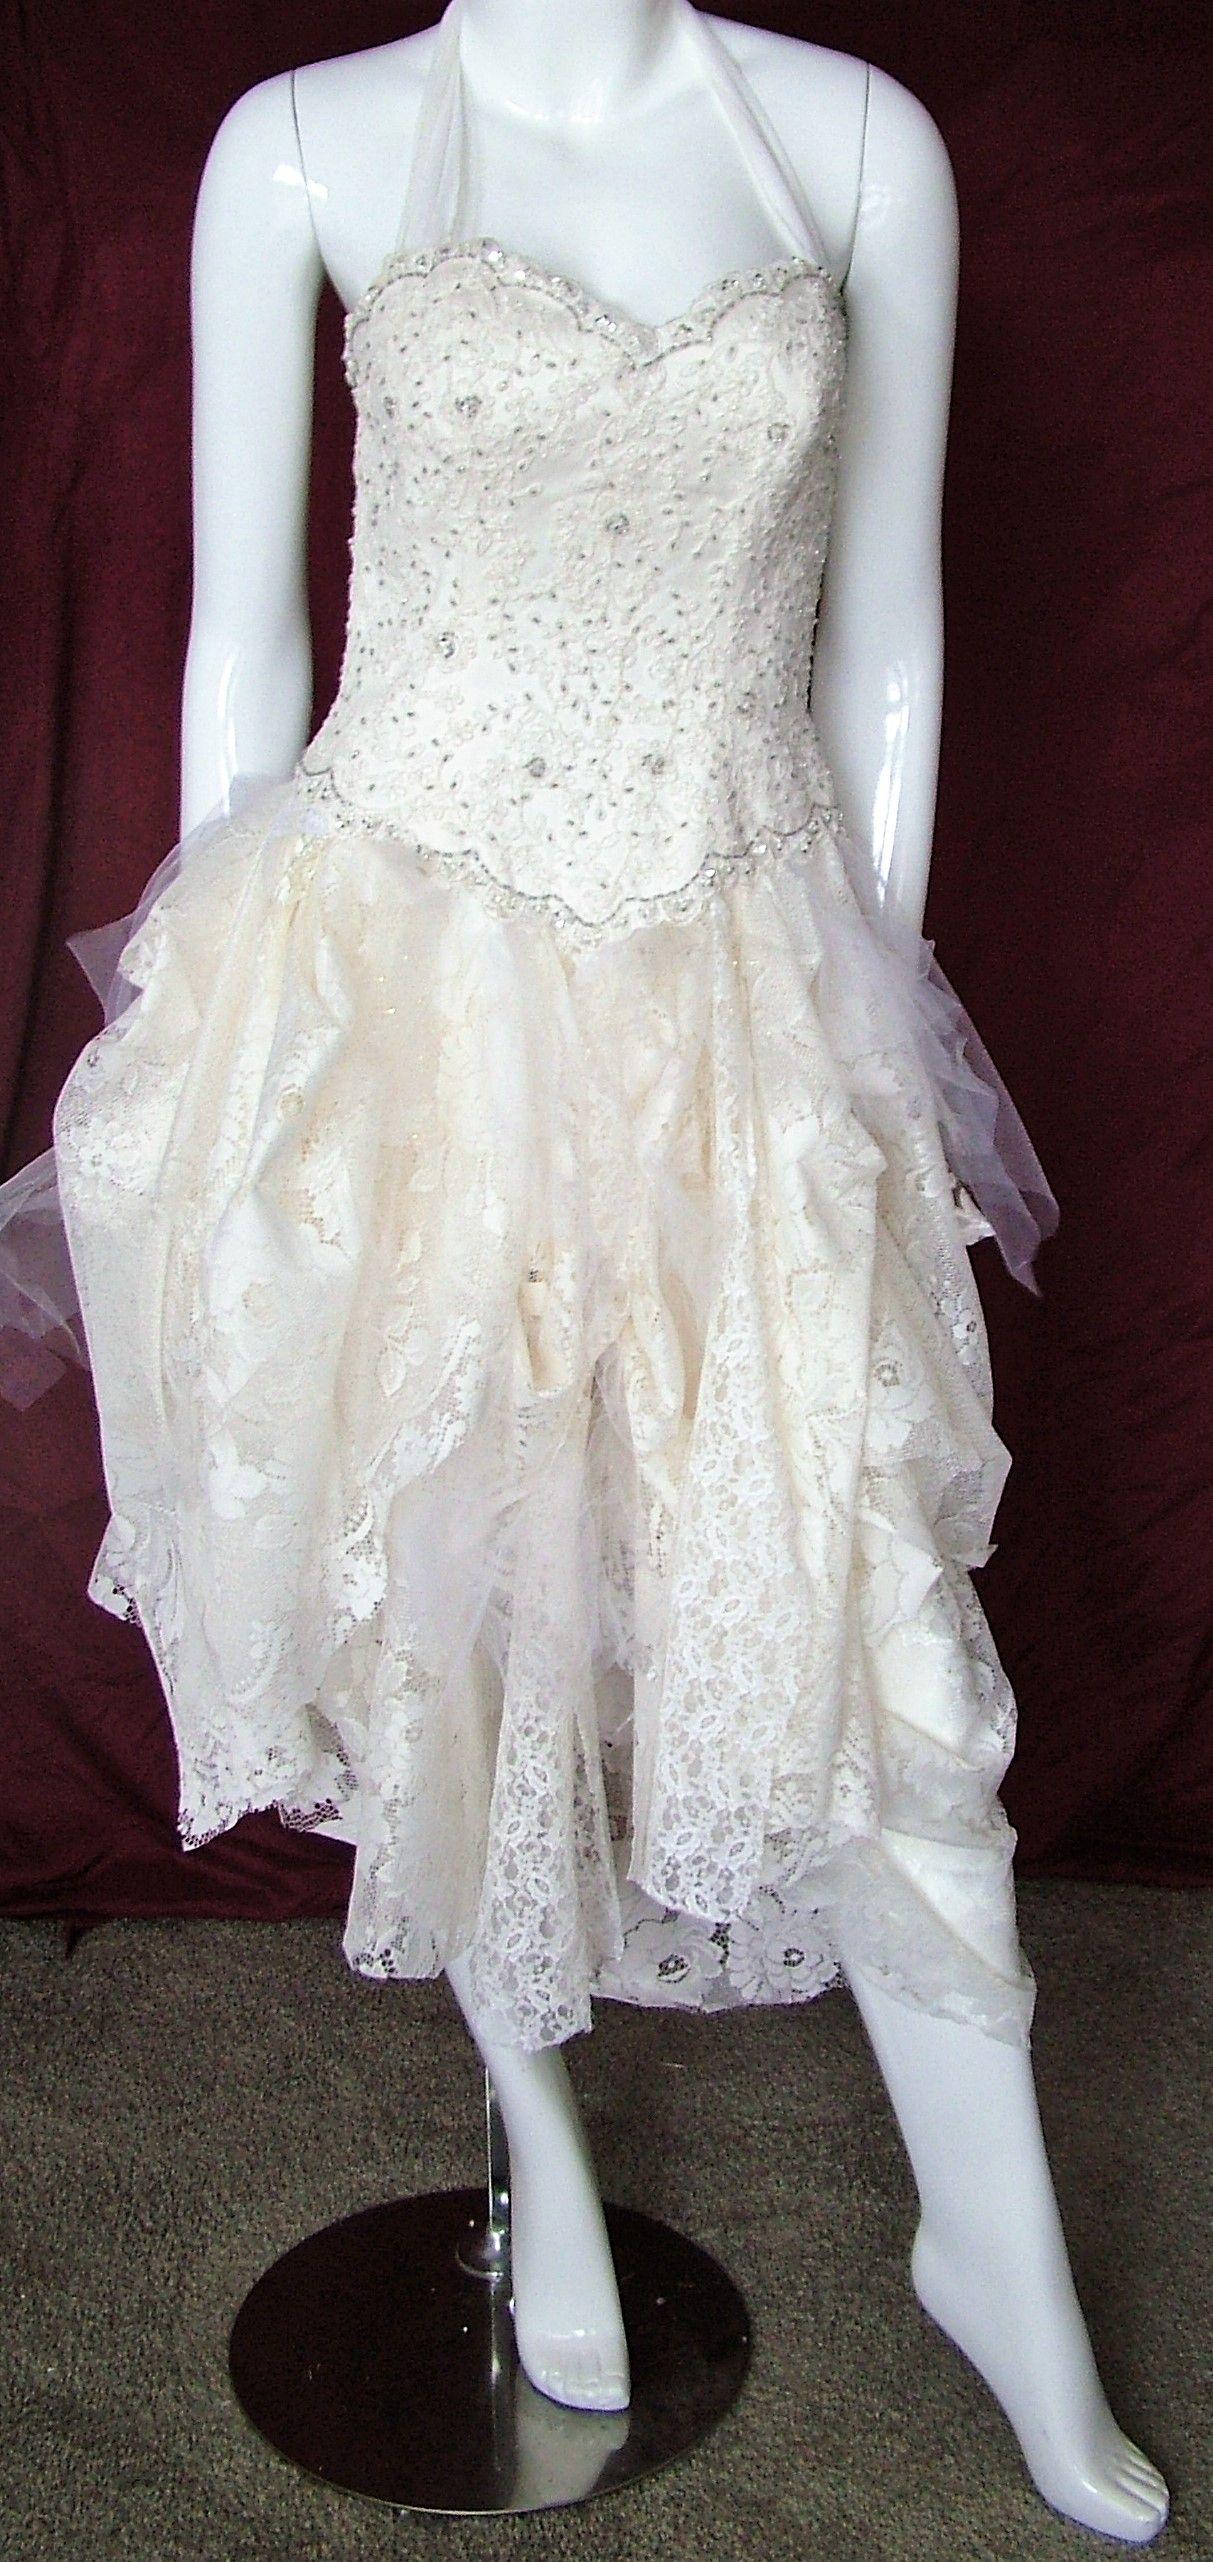 Steampunk Wedding Dress for Sale